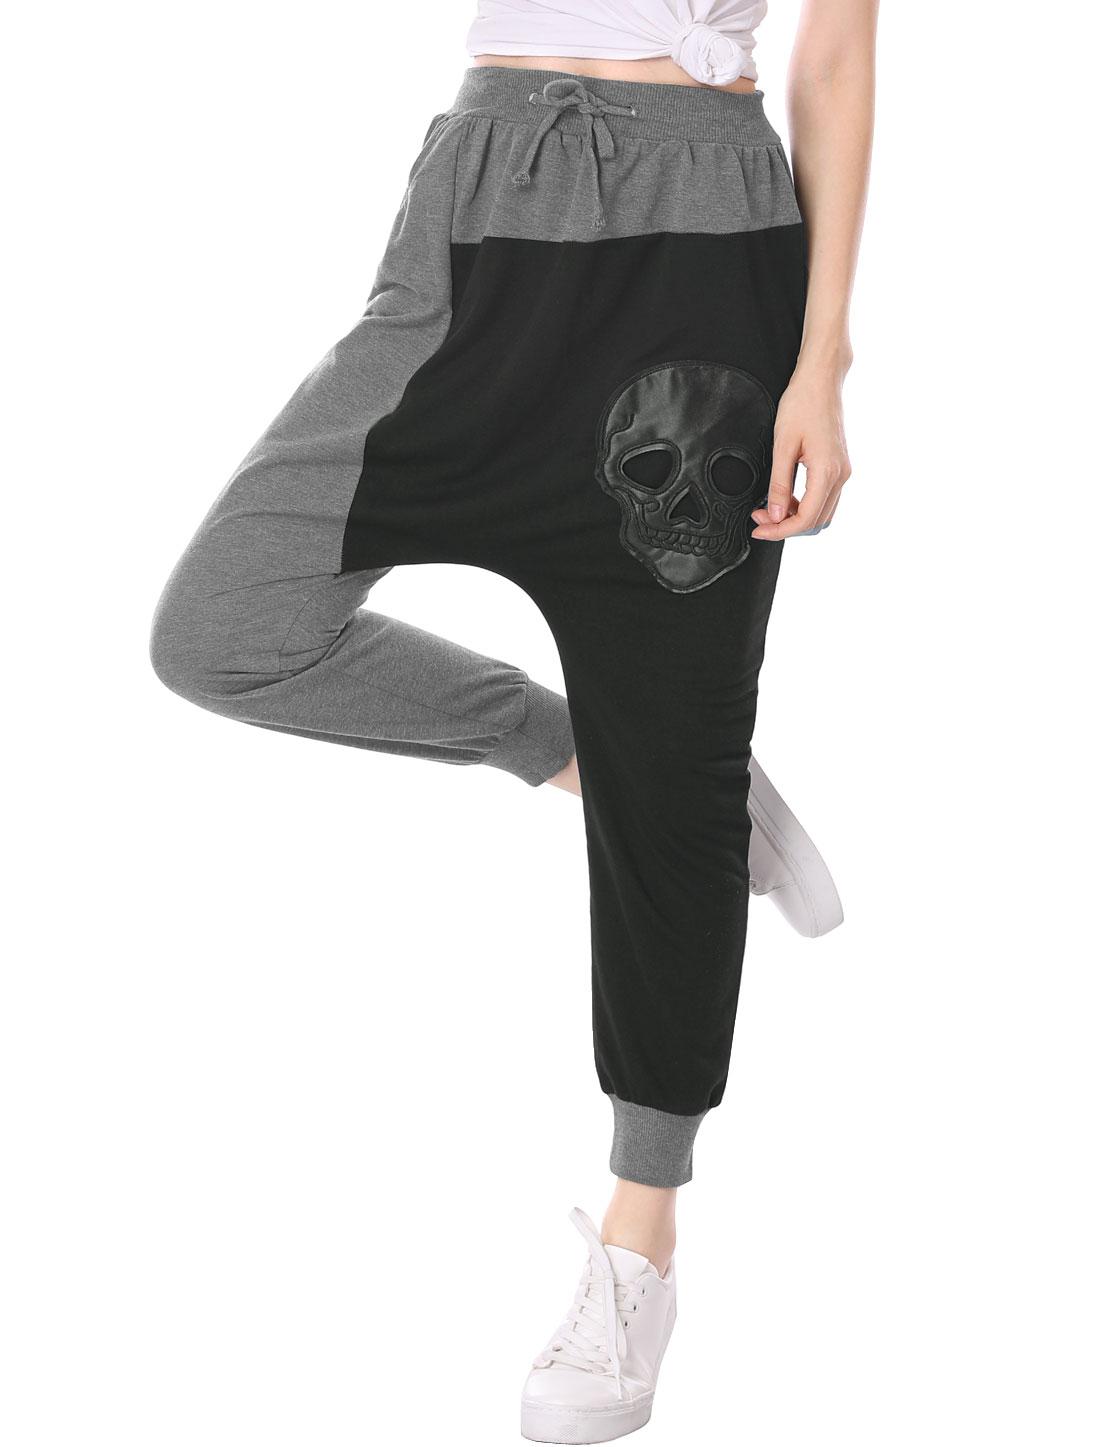 Lady Single Slant Pocket Stretch Waist Harem Pants Dark Gray Black L